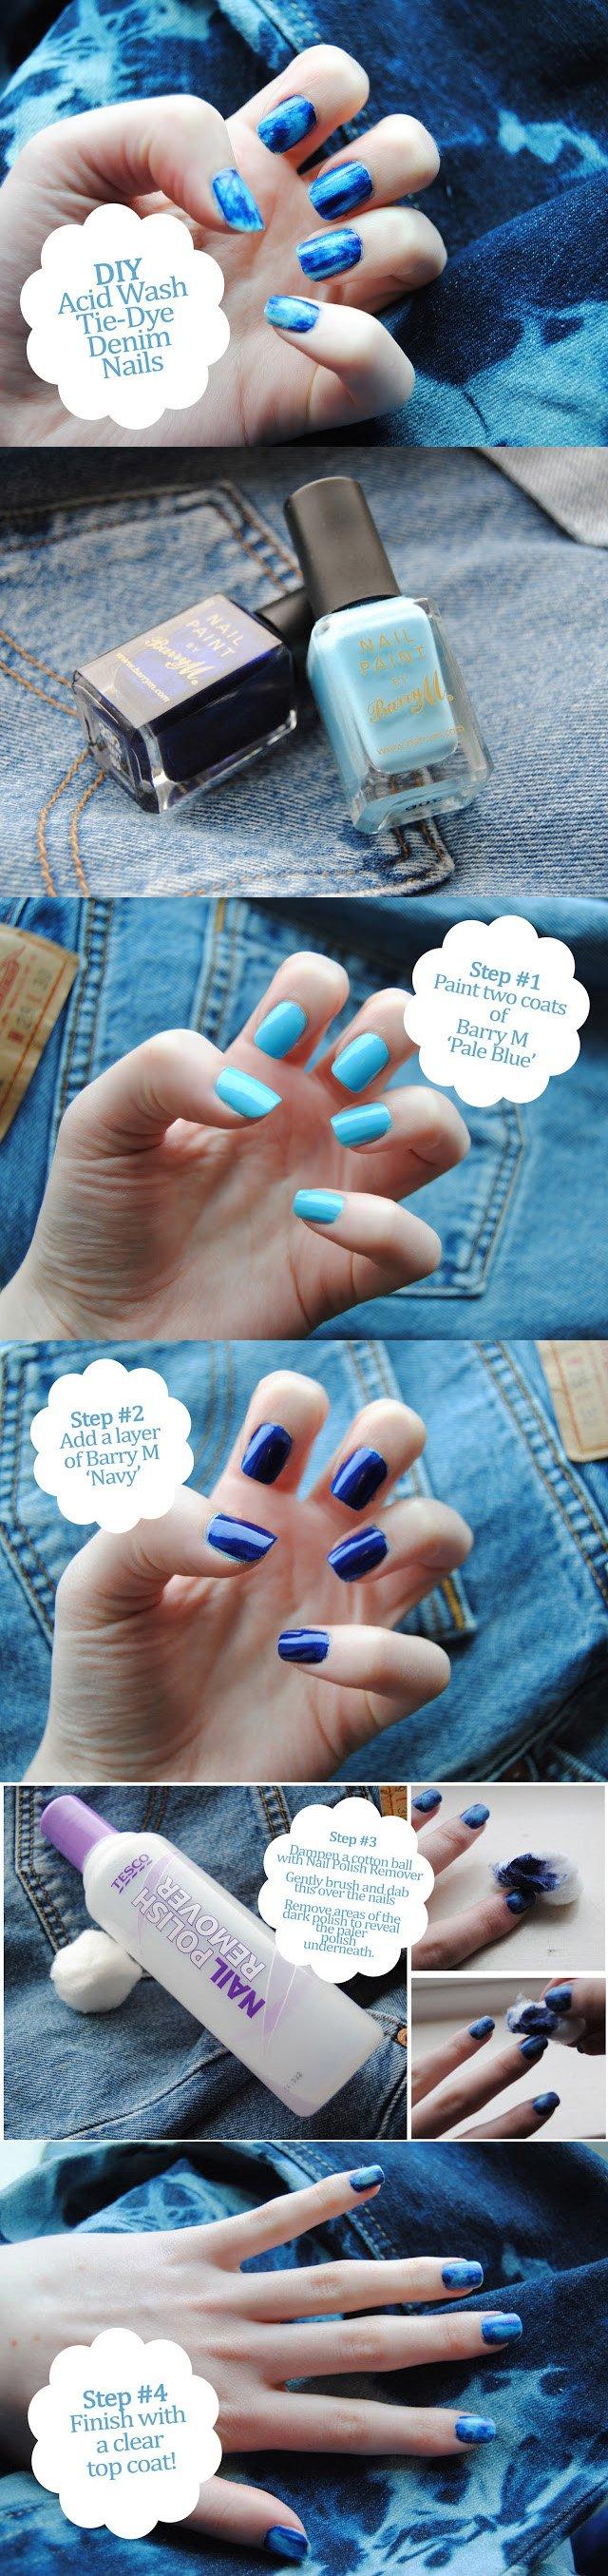 Do It Yourself Acid Wash Denim Nails